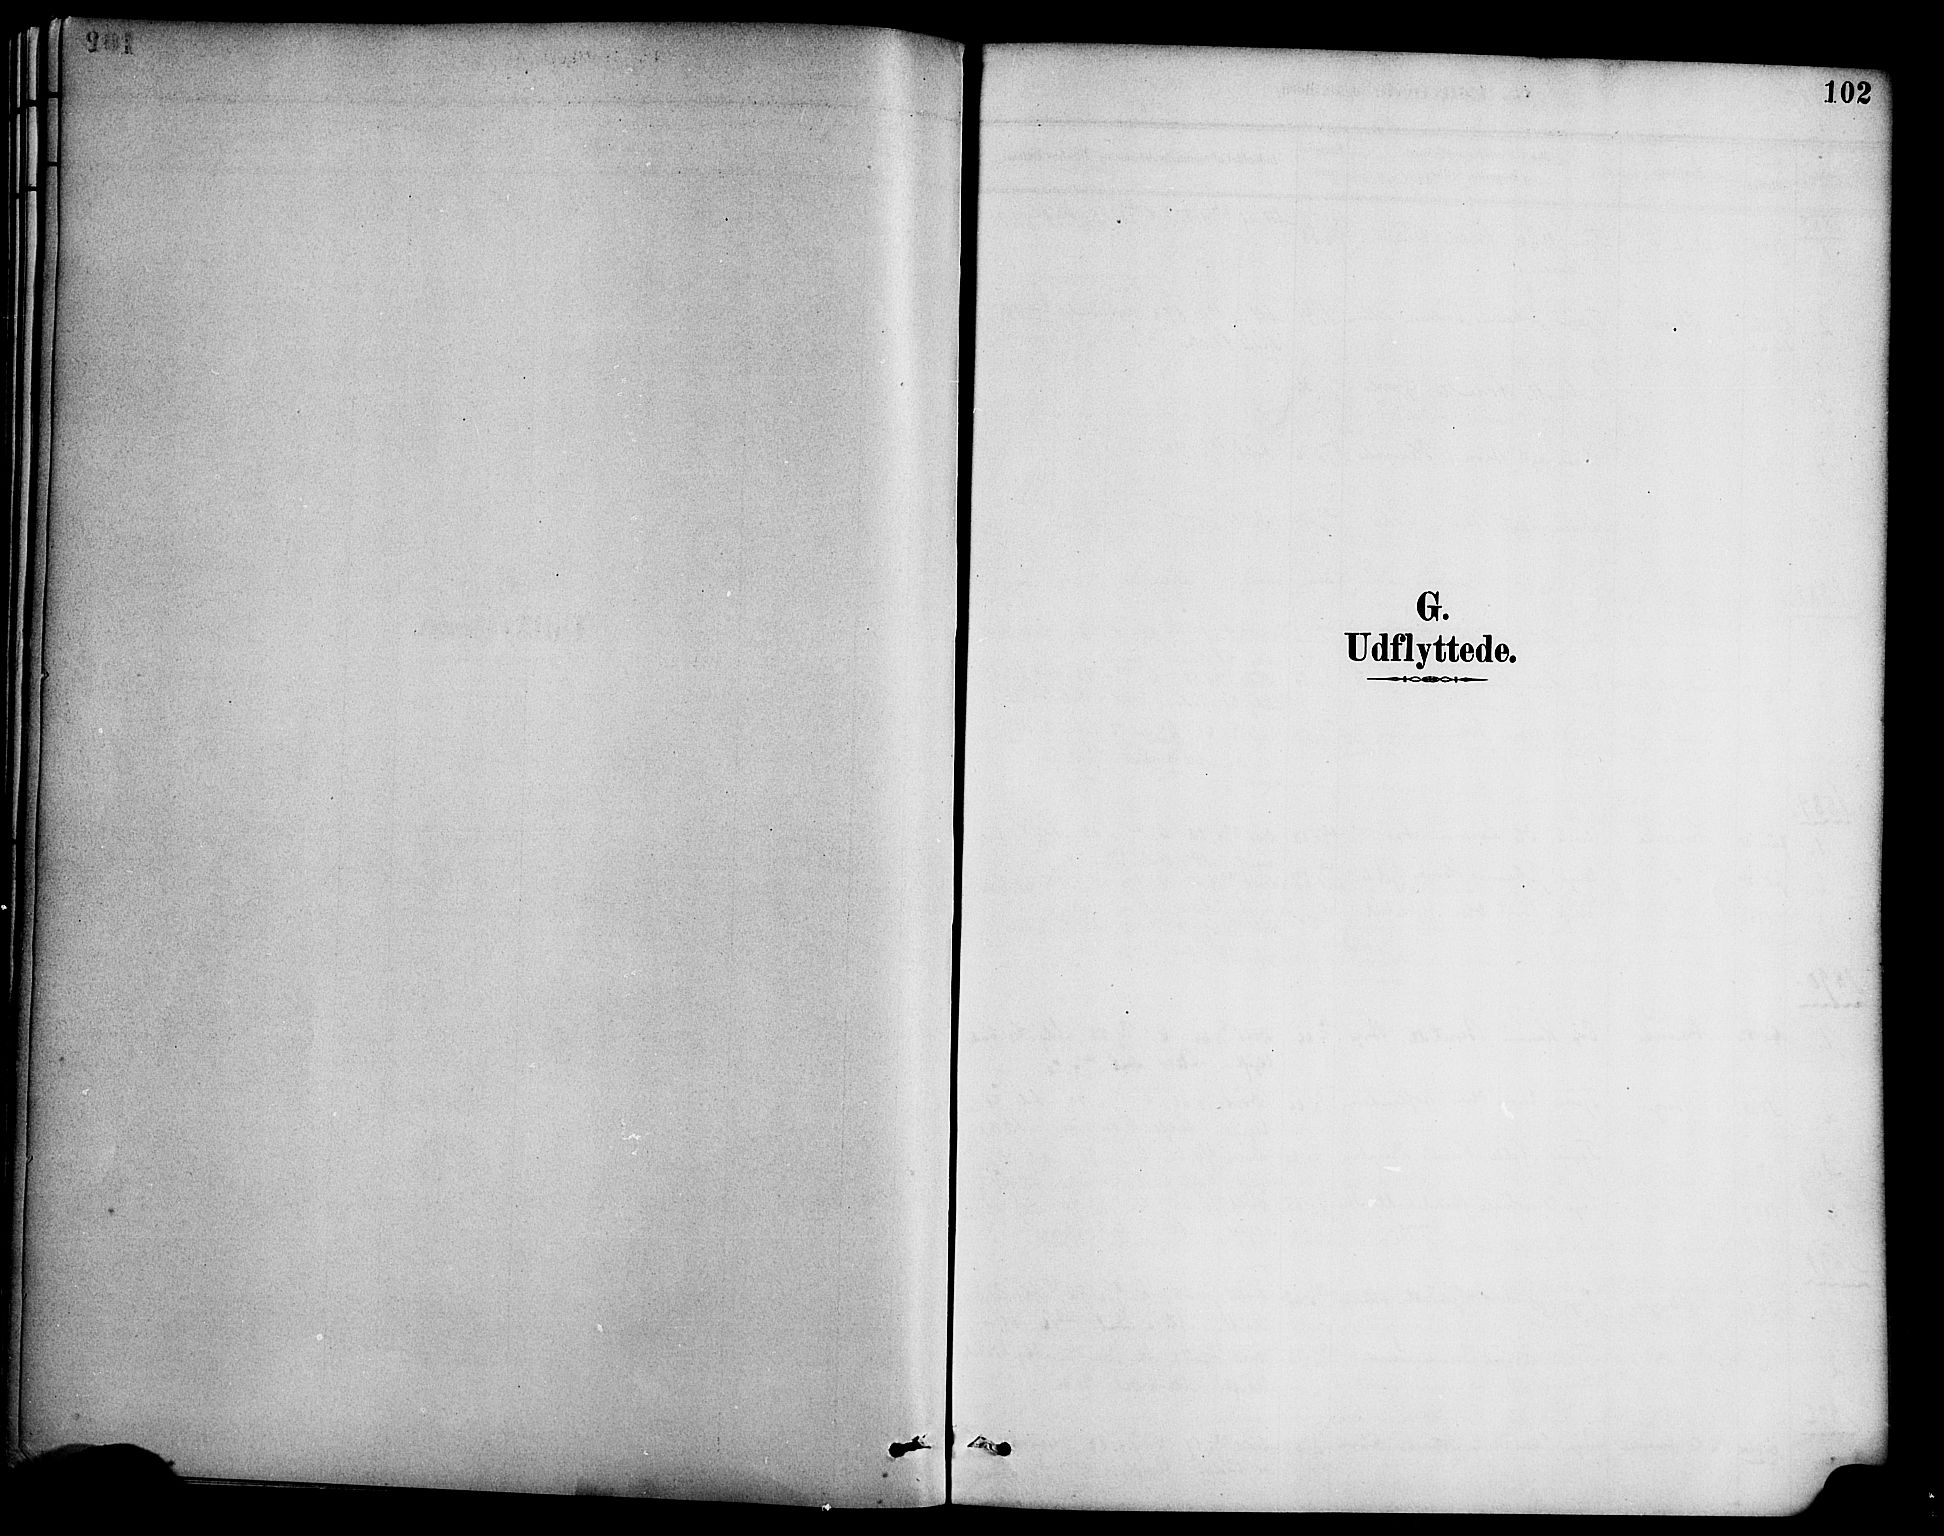 SAB, Hyllestad Sokneprestembete, Ministerialbok nr. B 1, 1886-1904, s. 102